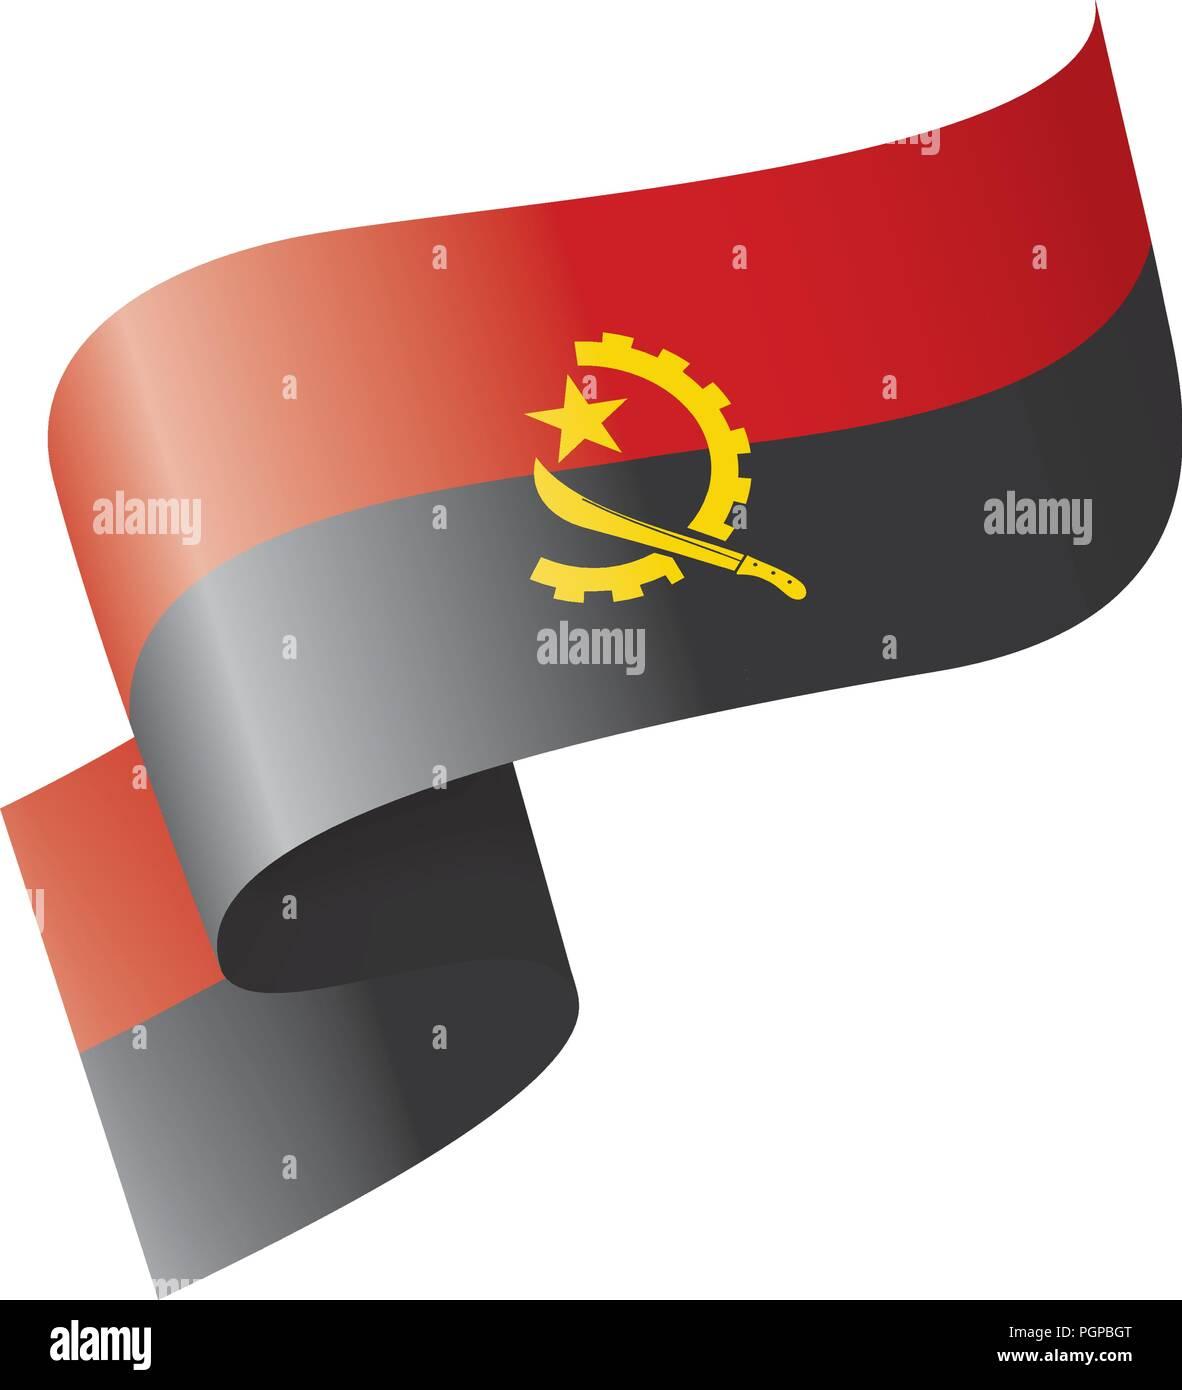 Angola flag, vector illustration on a white background - Stock Image